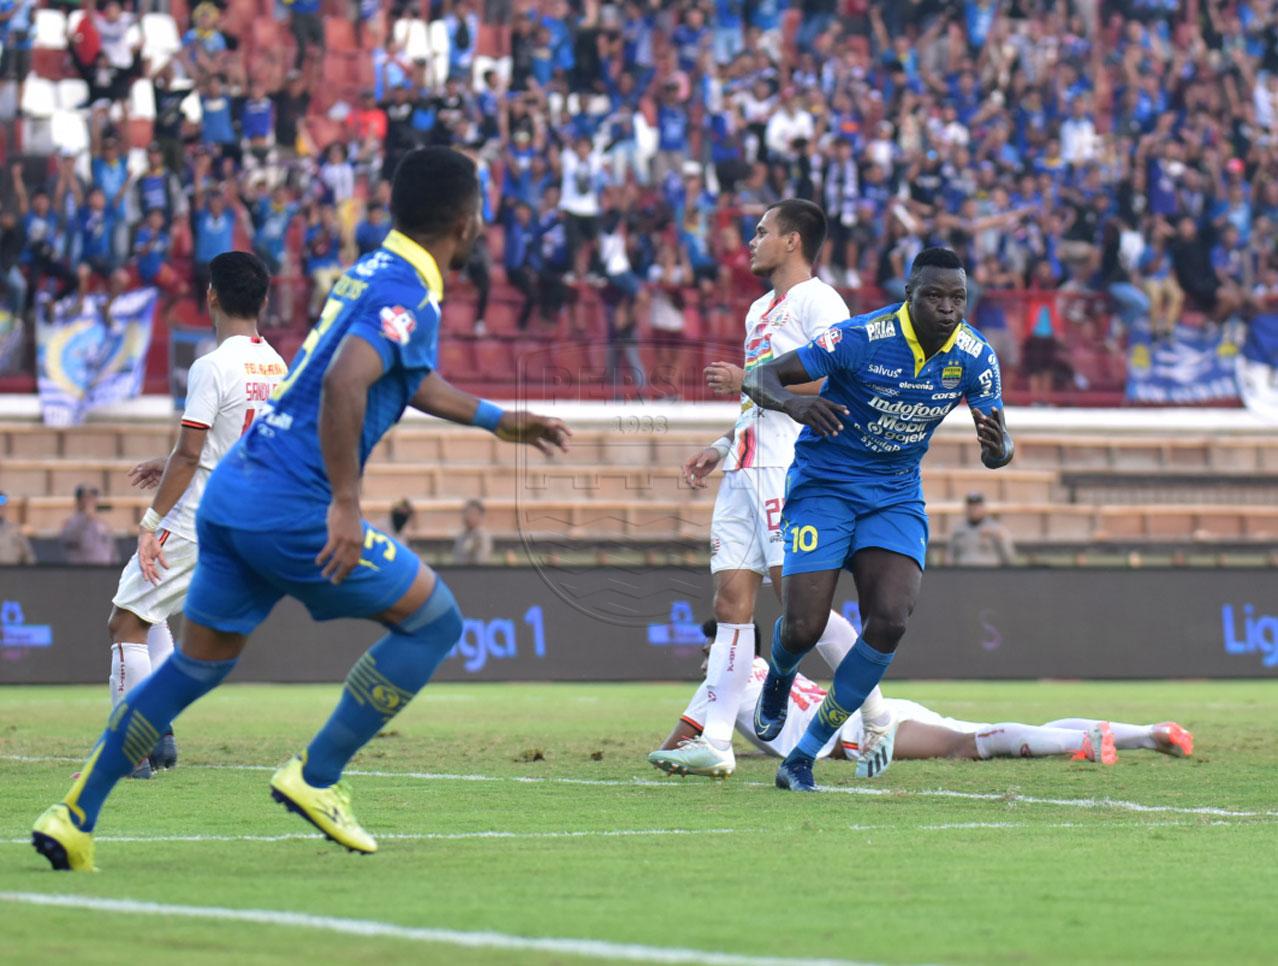 Persija's Woes Continues as They Lose Indonesian El Clásico